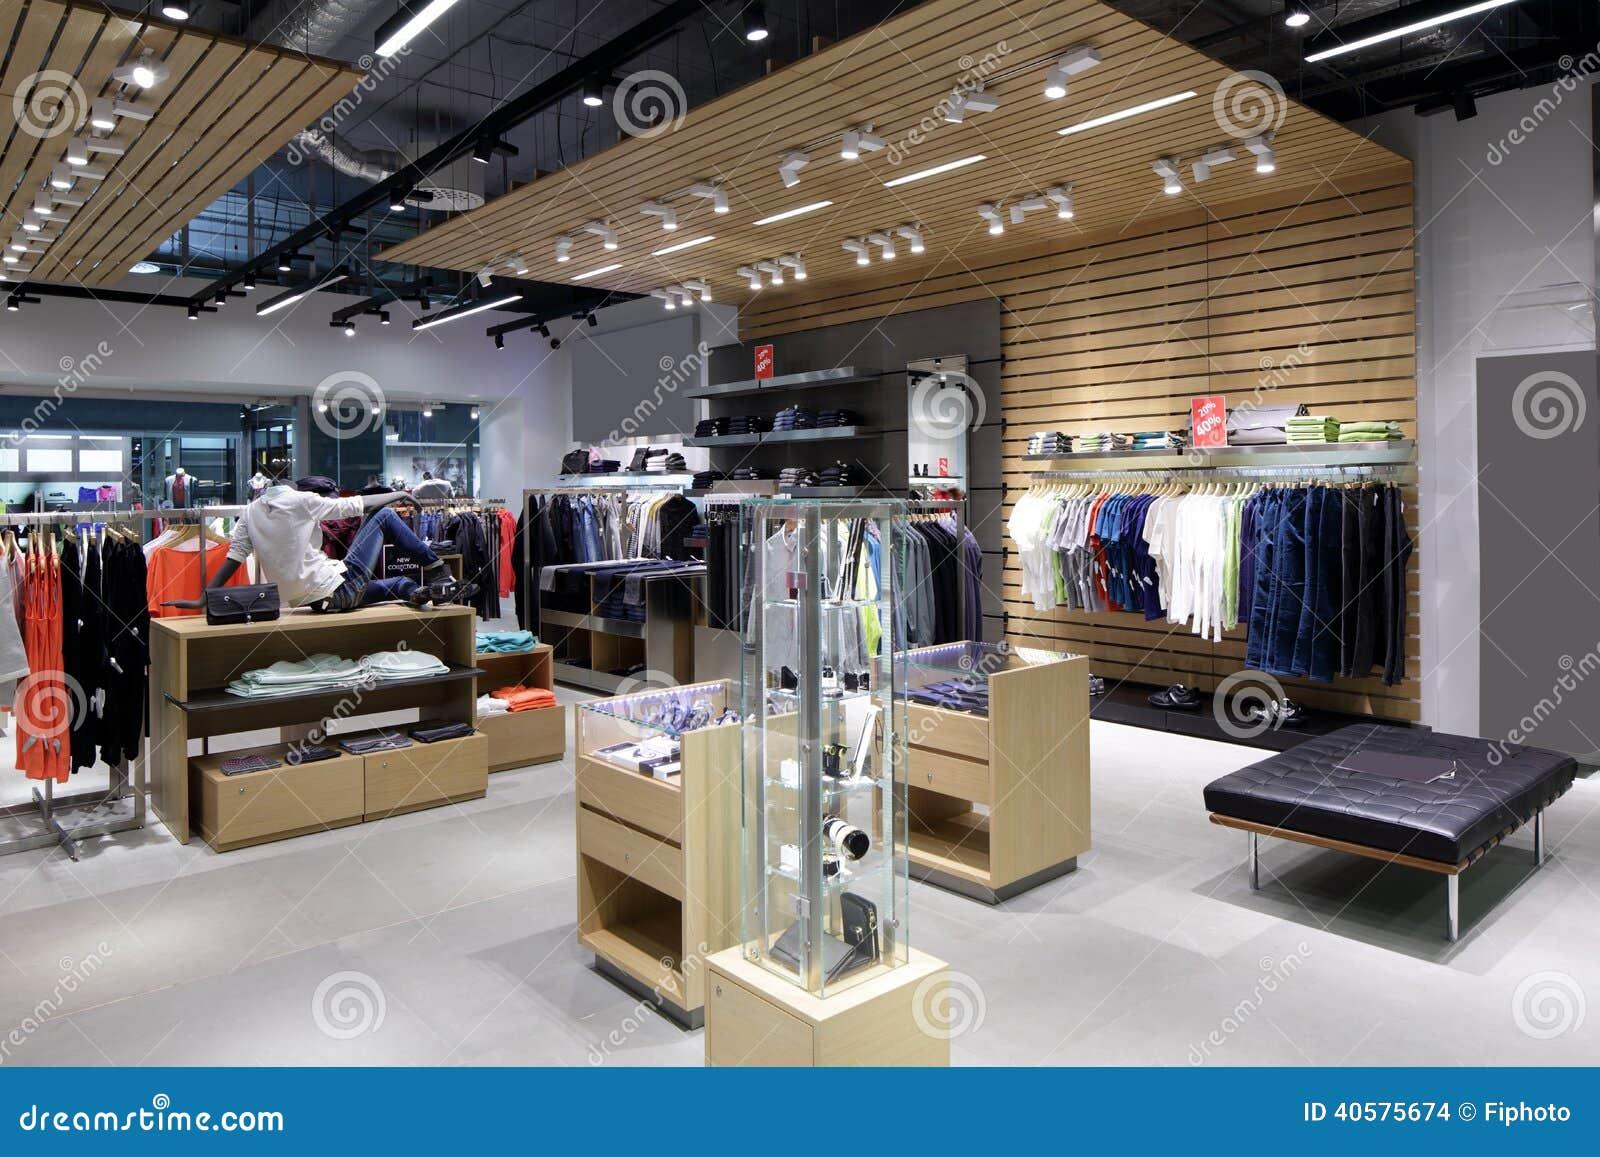 Business in fashion merchandising 34